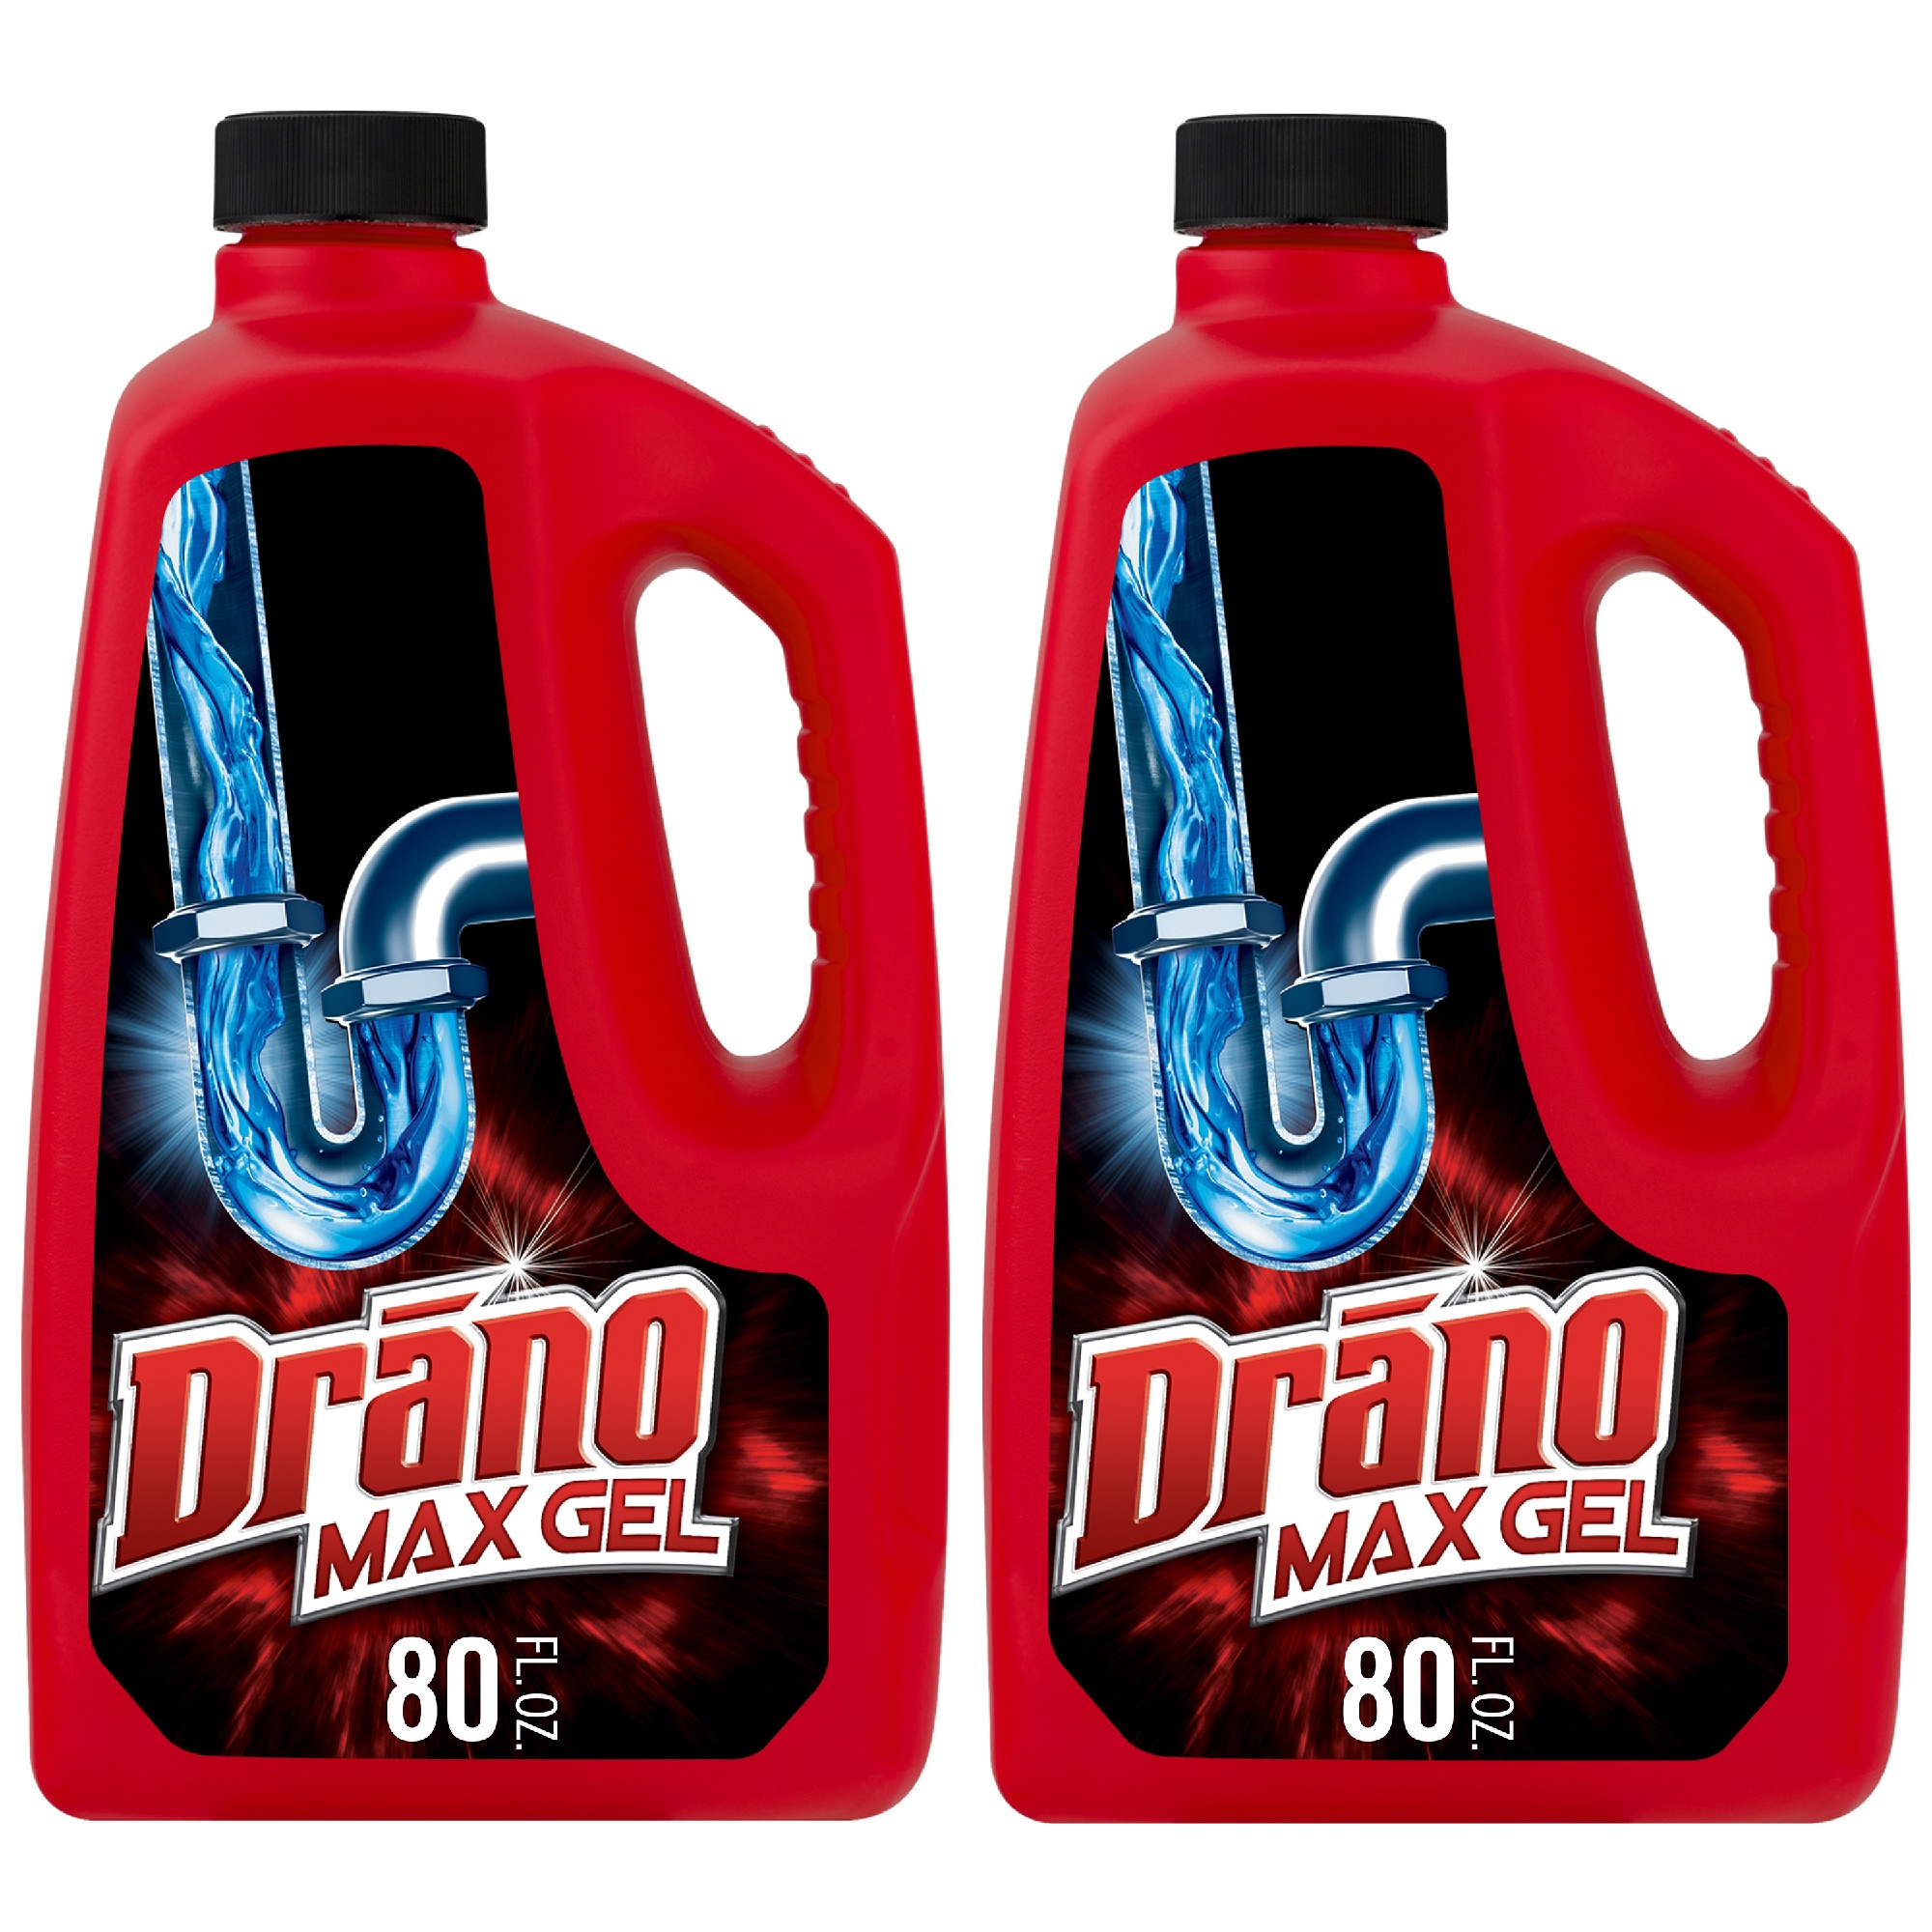 Drano max gel clog remover-1